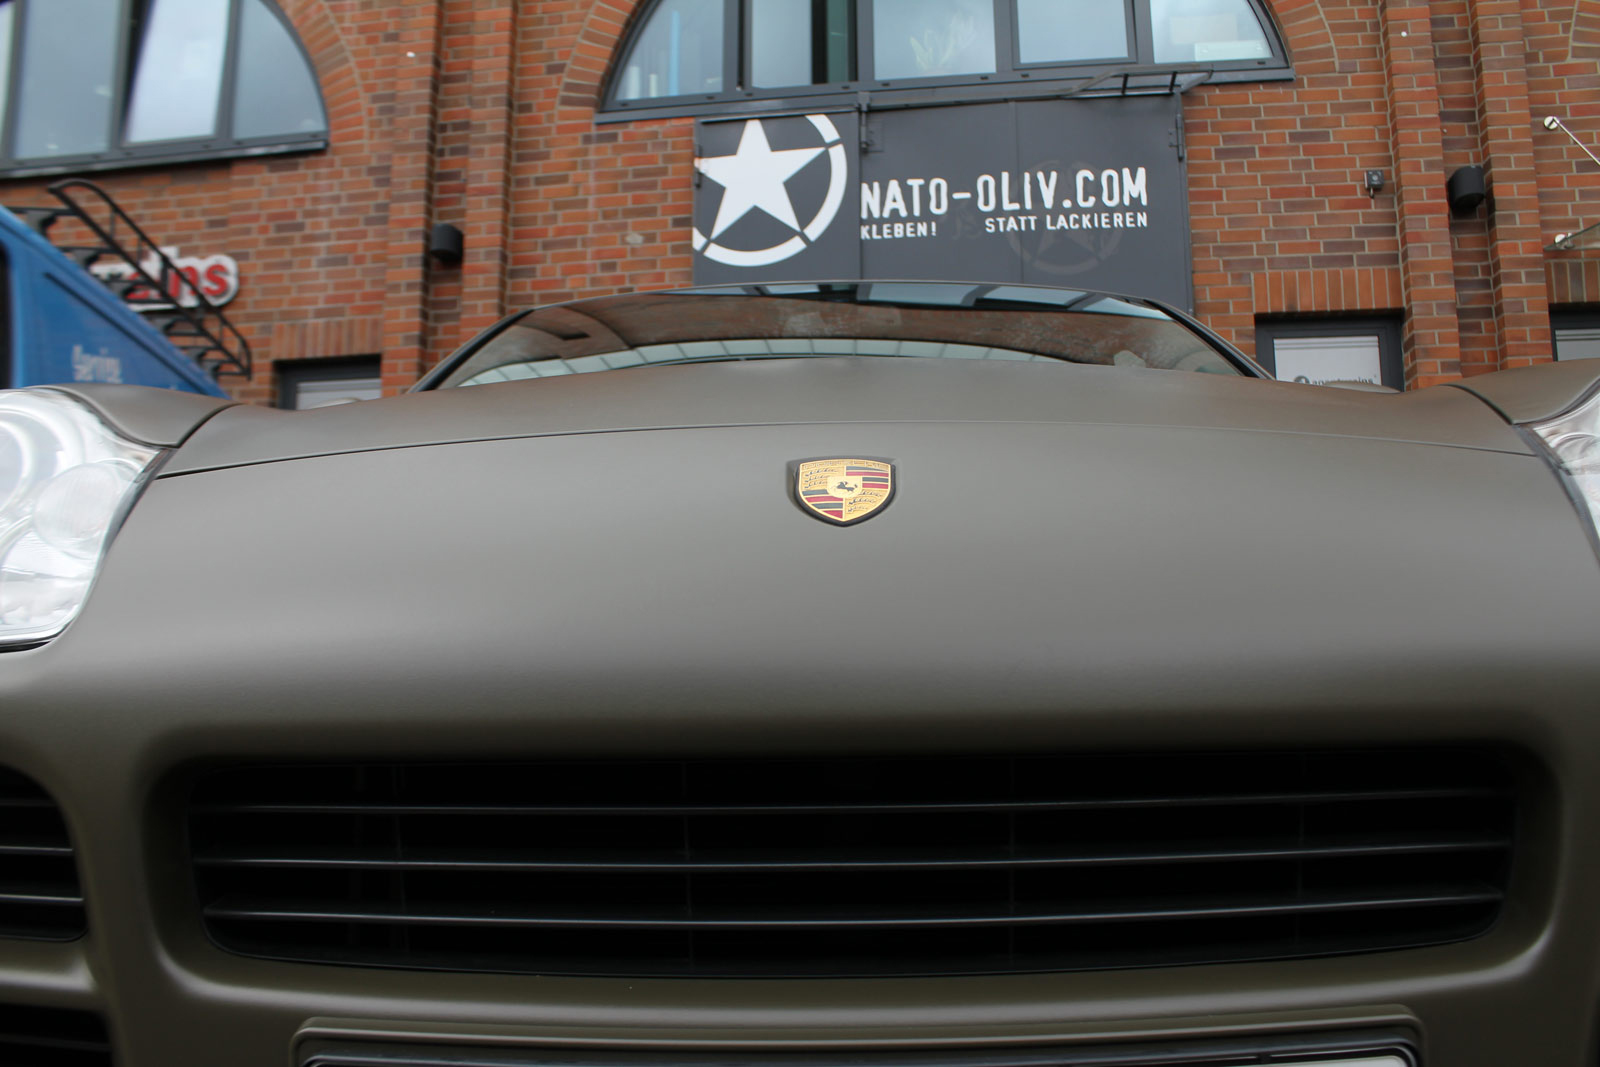 Porsche_Cayenne_Folierung_Nato-Oliv_Matt_23